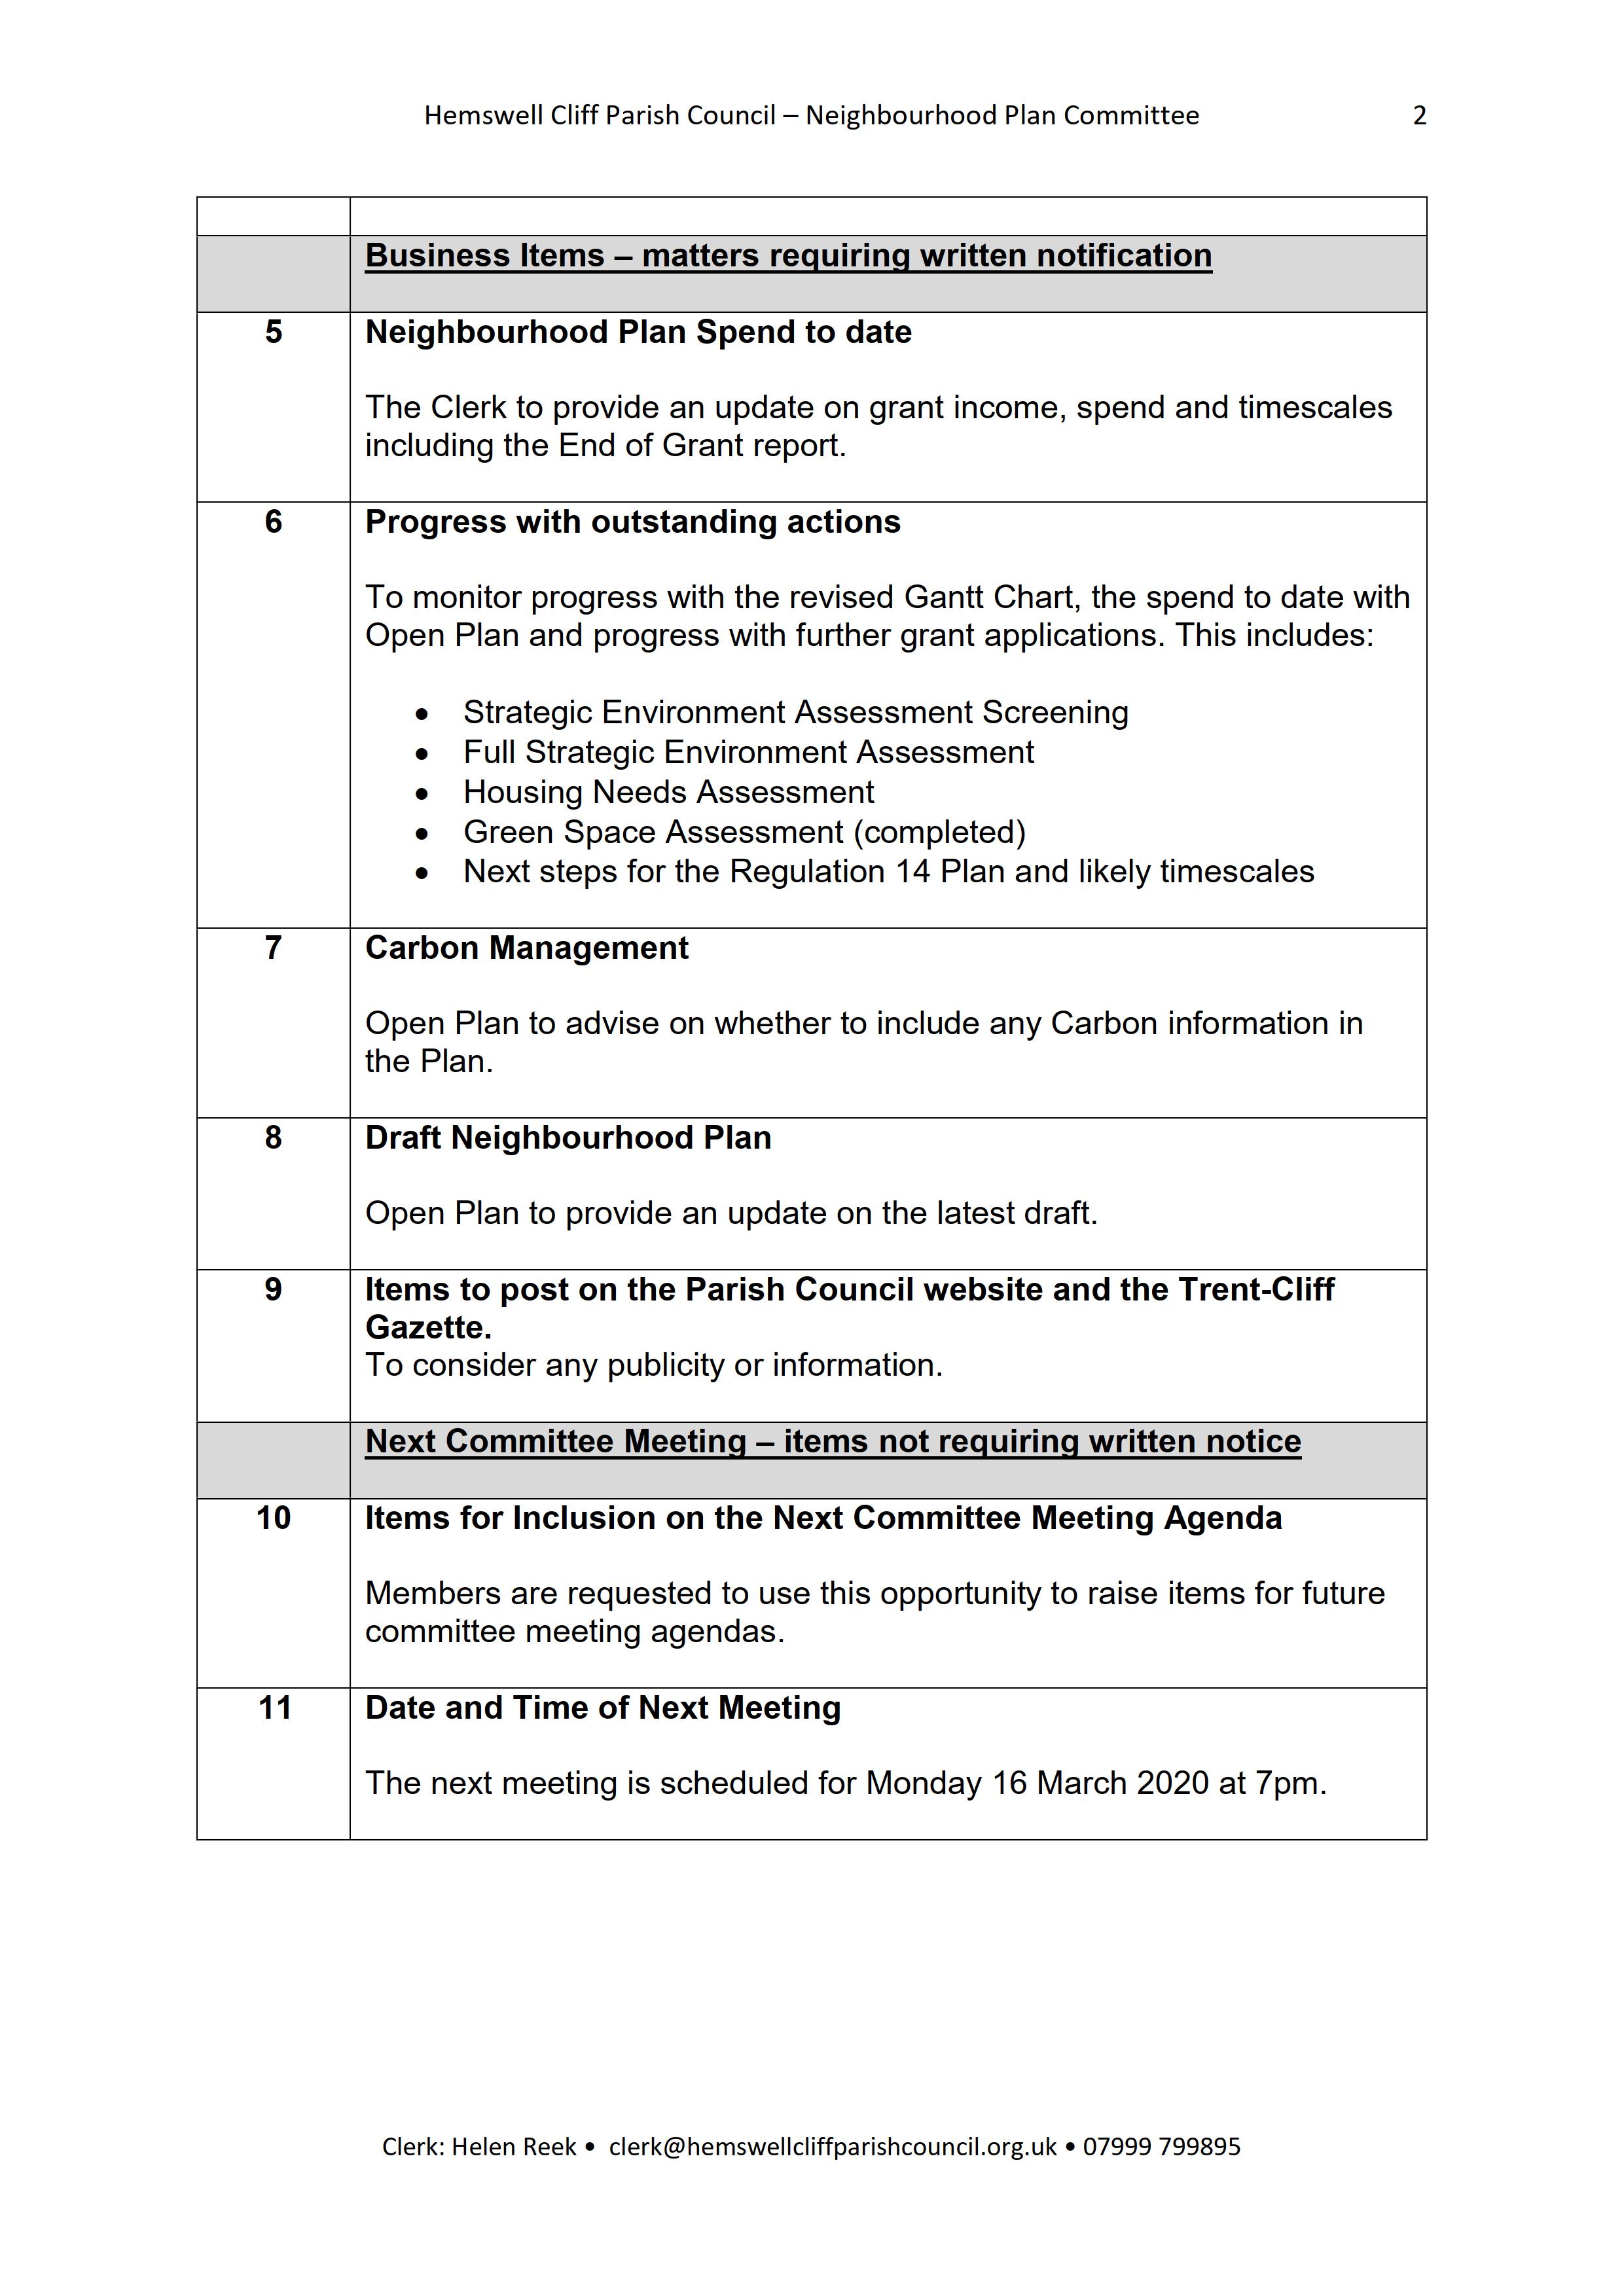 HCPC_NPC_Agenda_17.02.20_2.png